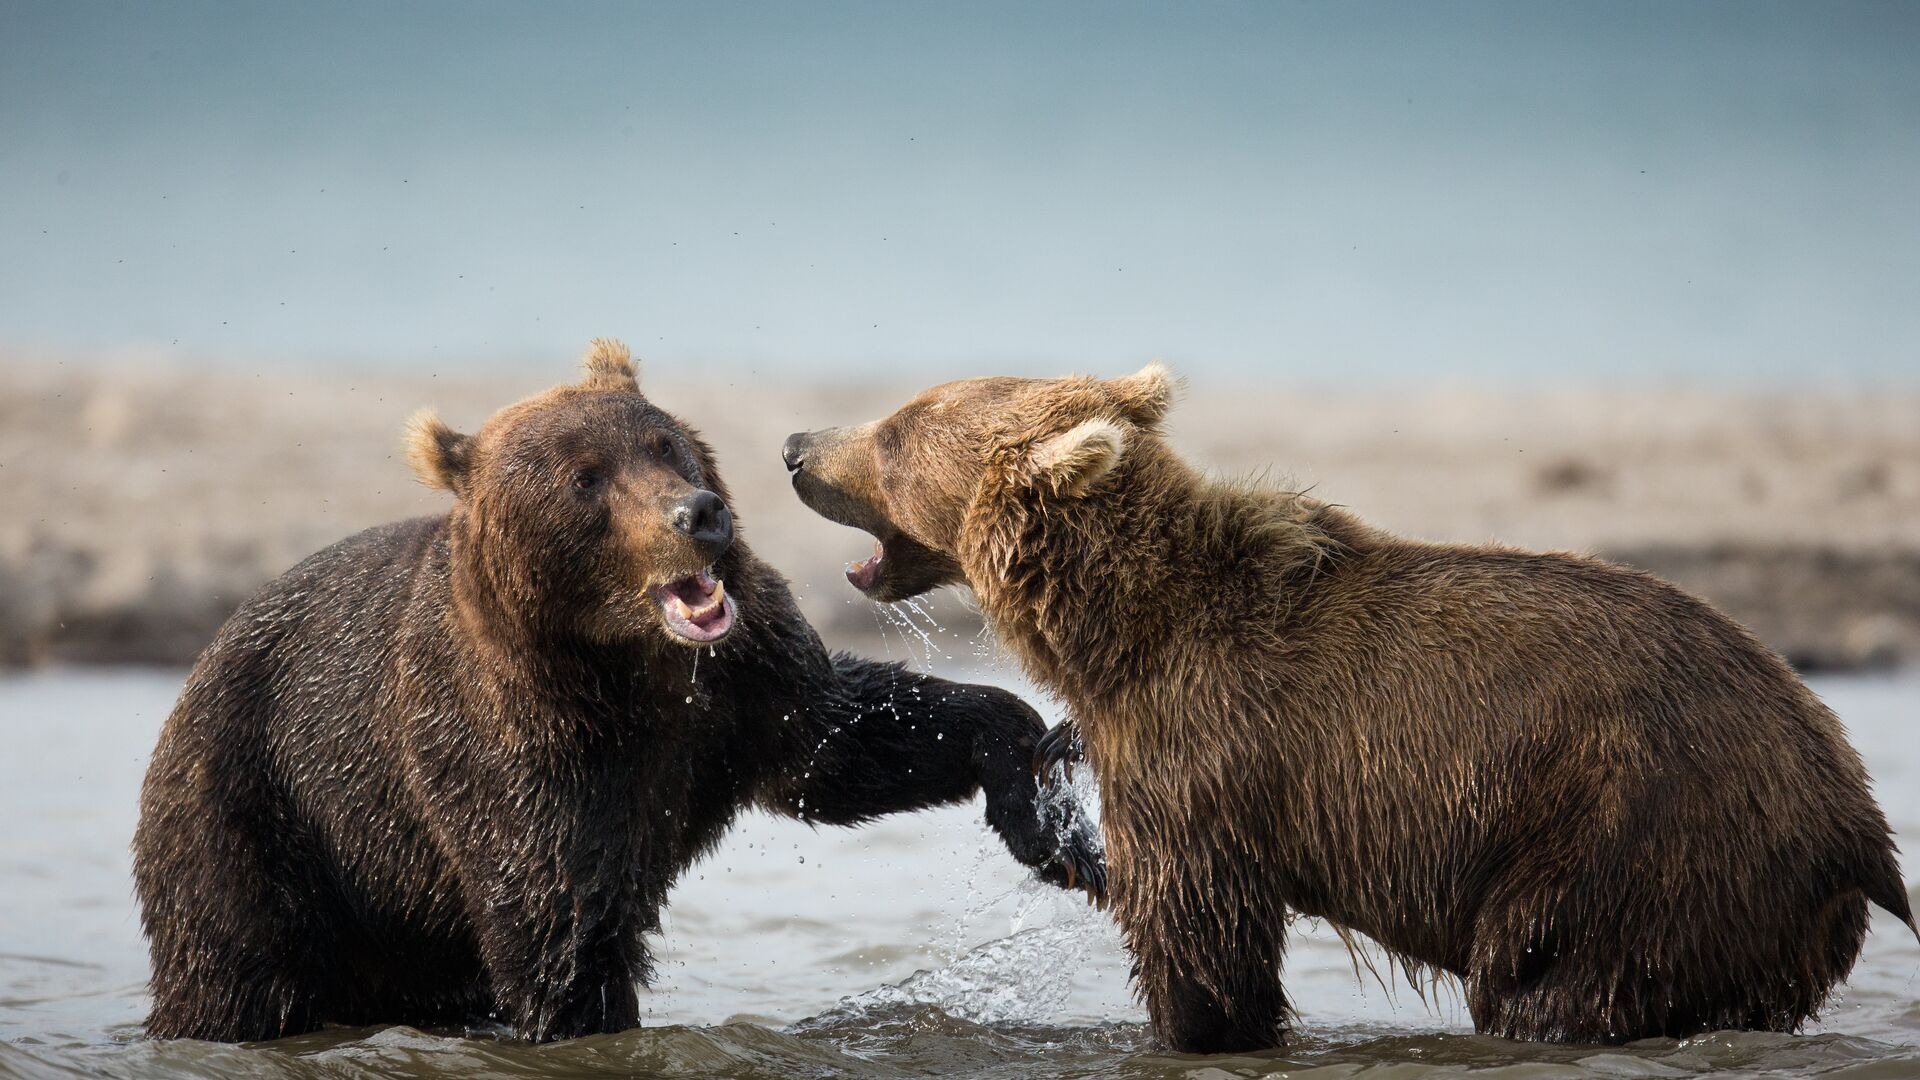 Камчатские медведи - РИА Новости, 1920, 30.09.2020